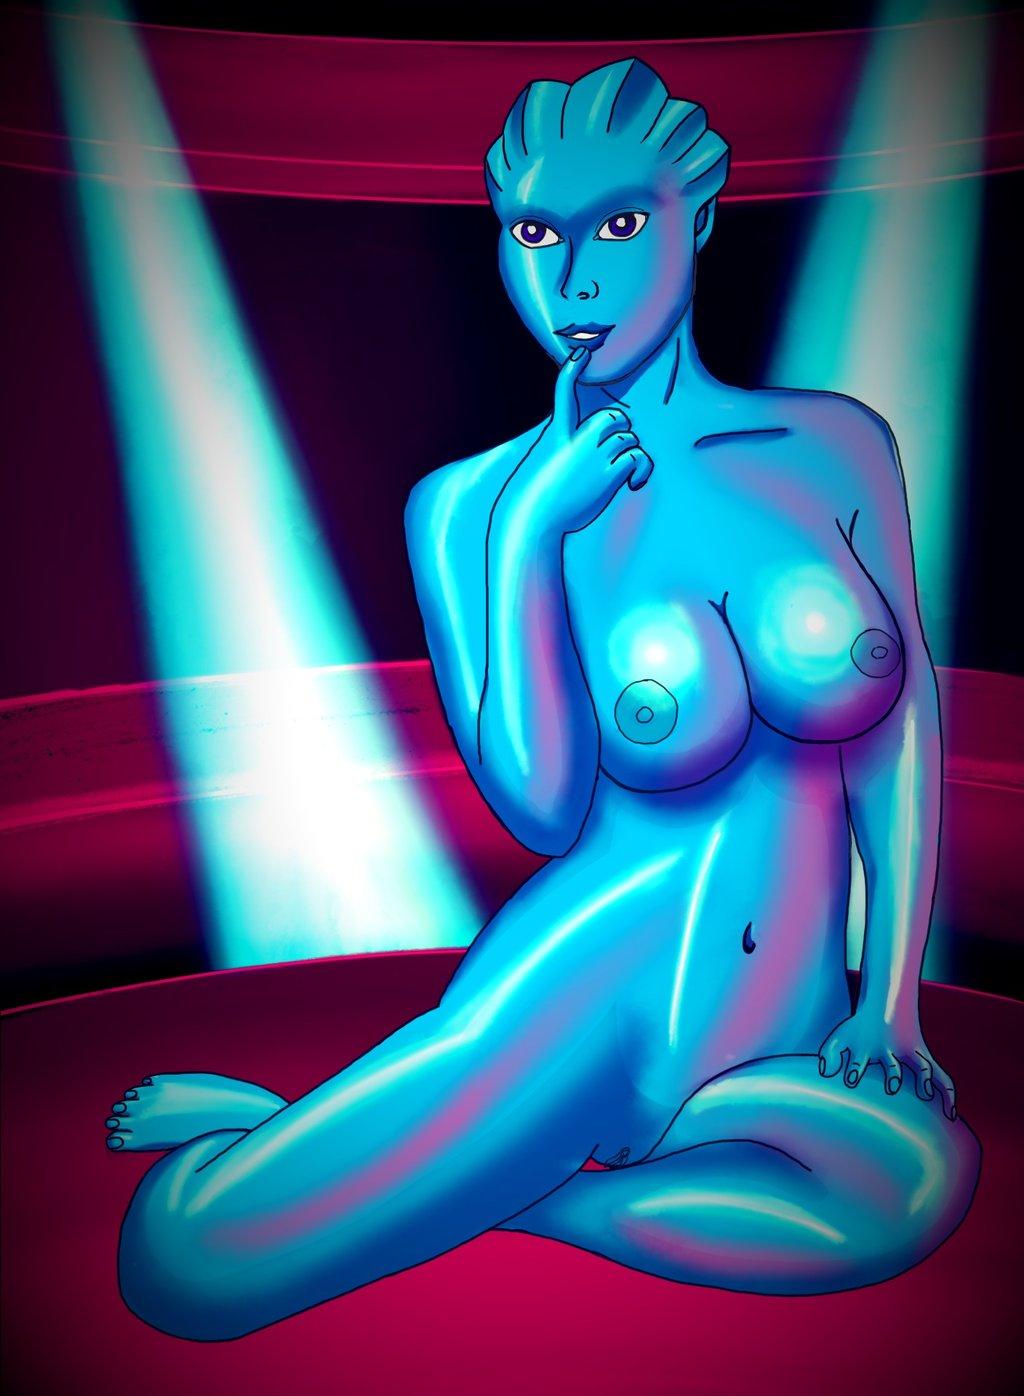 Mass effect nude dancer mod smut scene